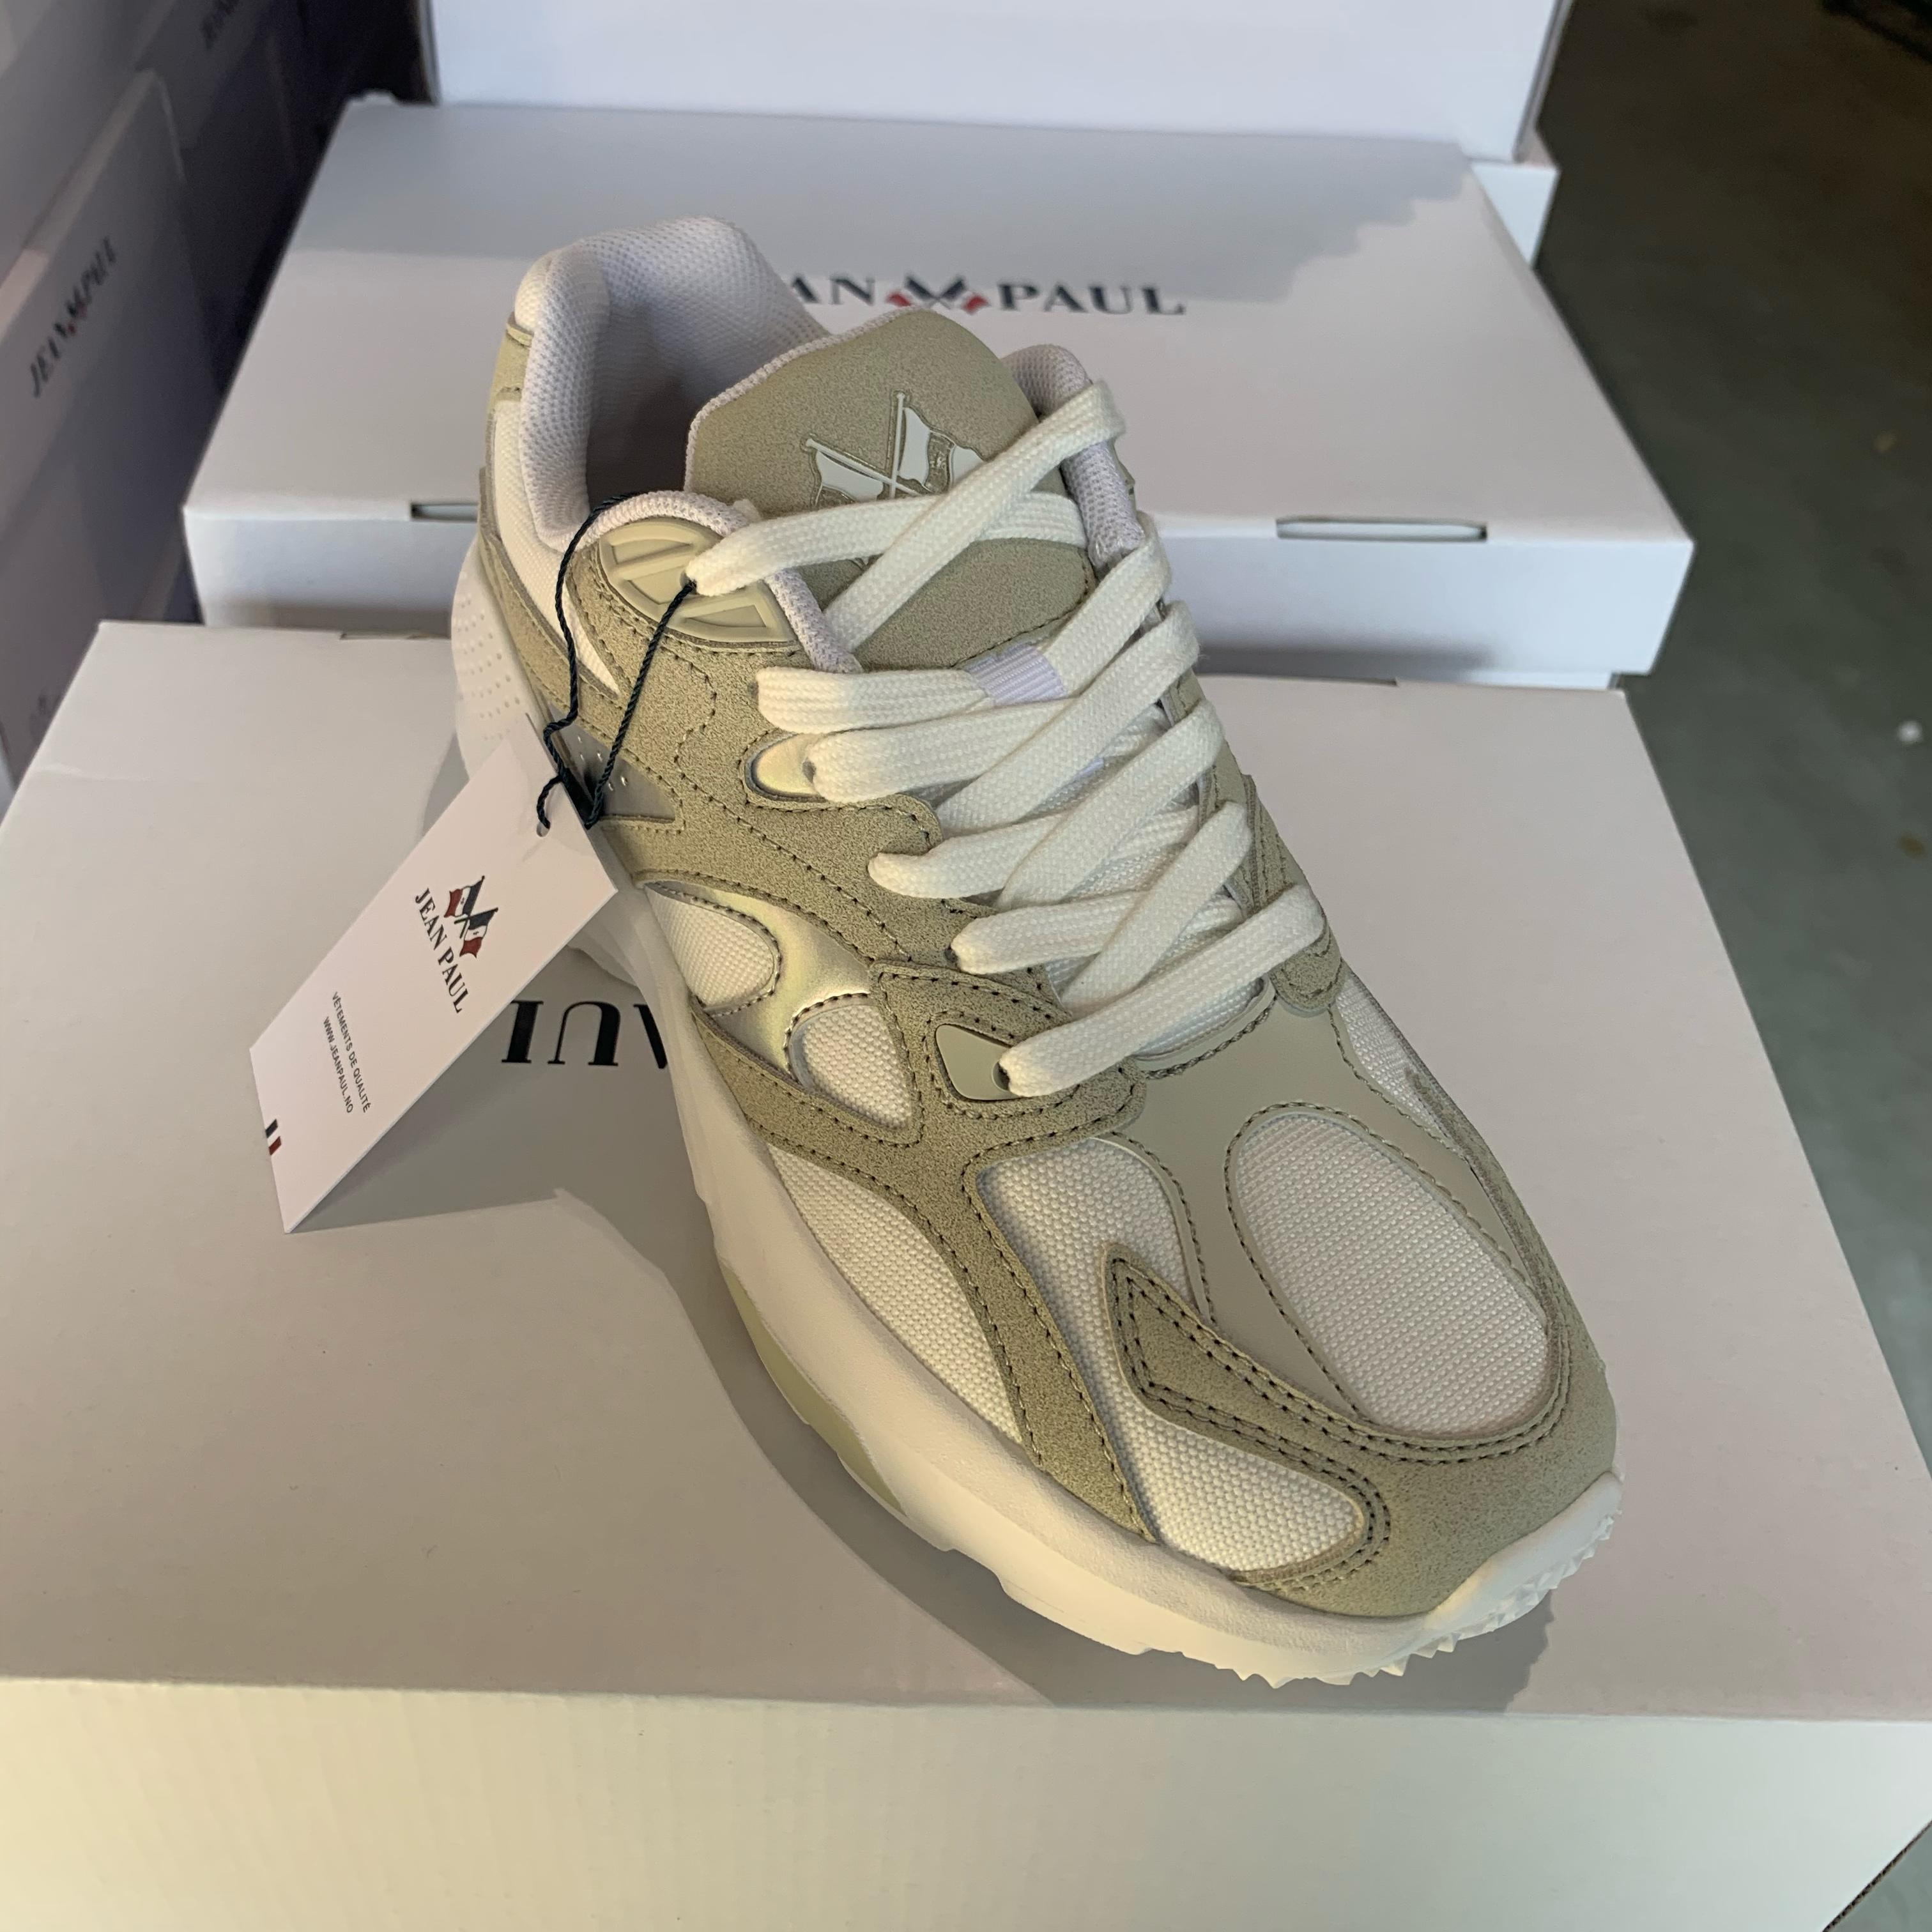 jean paul aix chunky sneakers white beige3